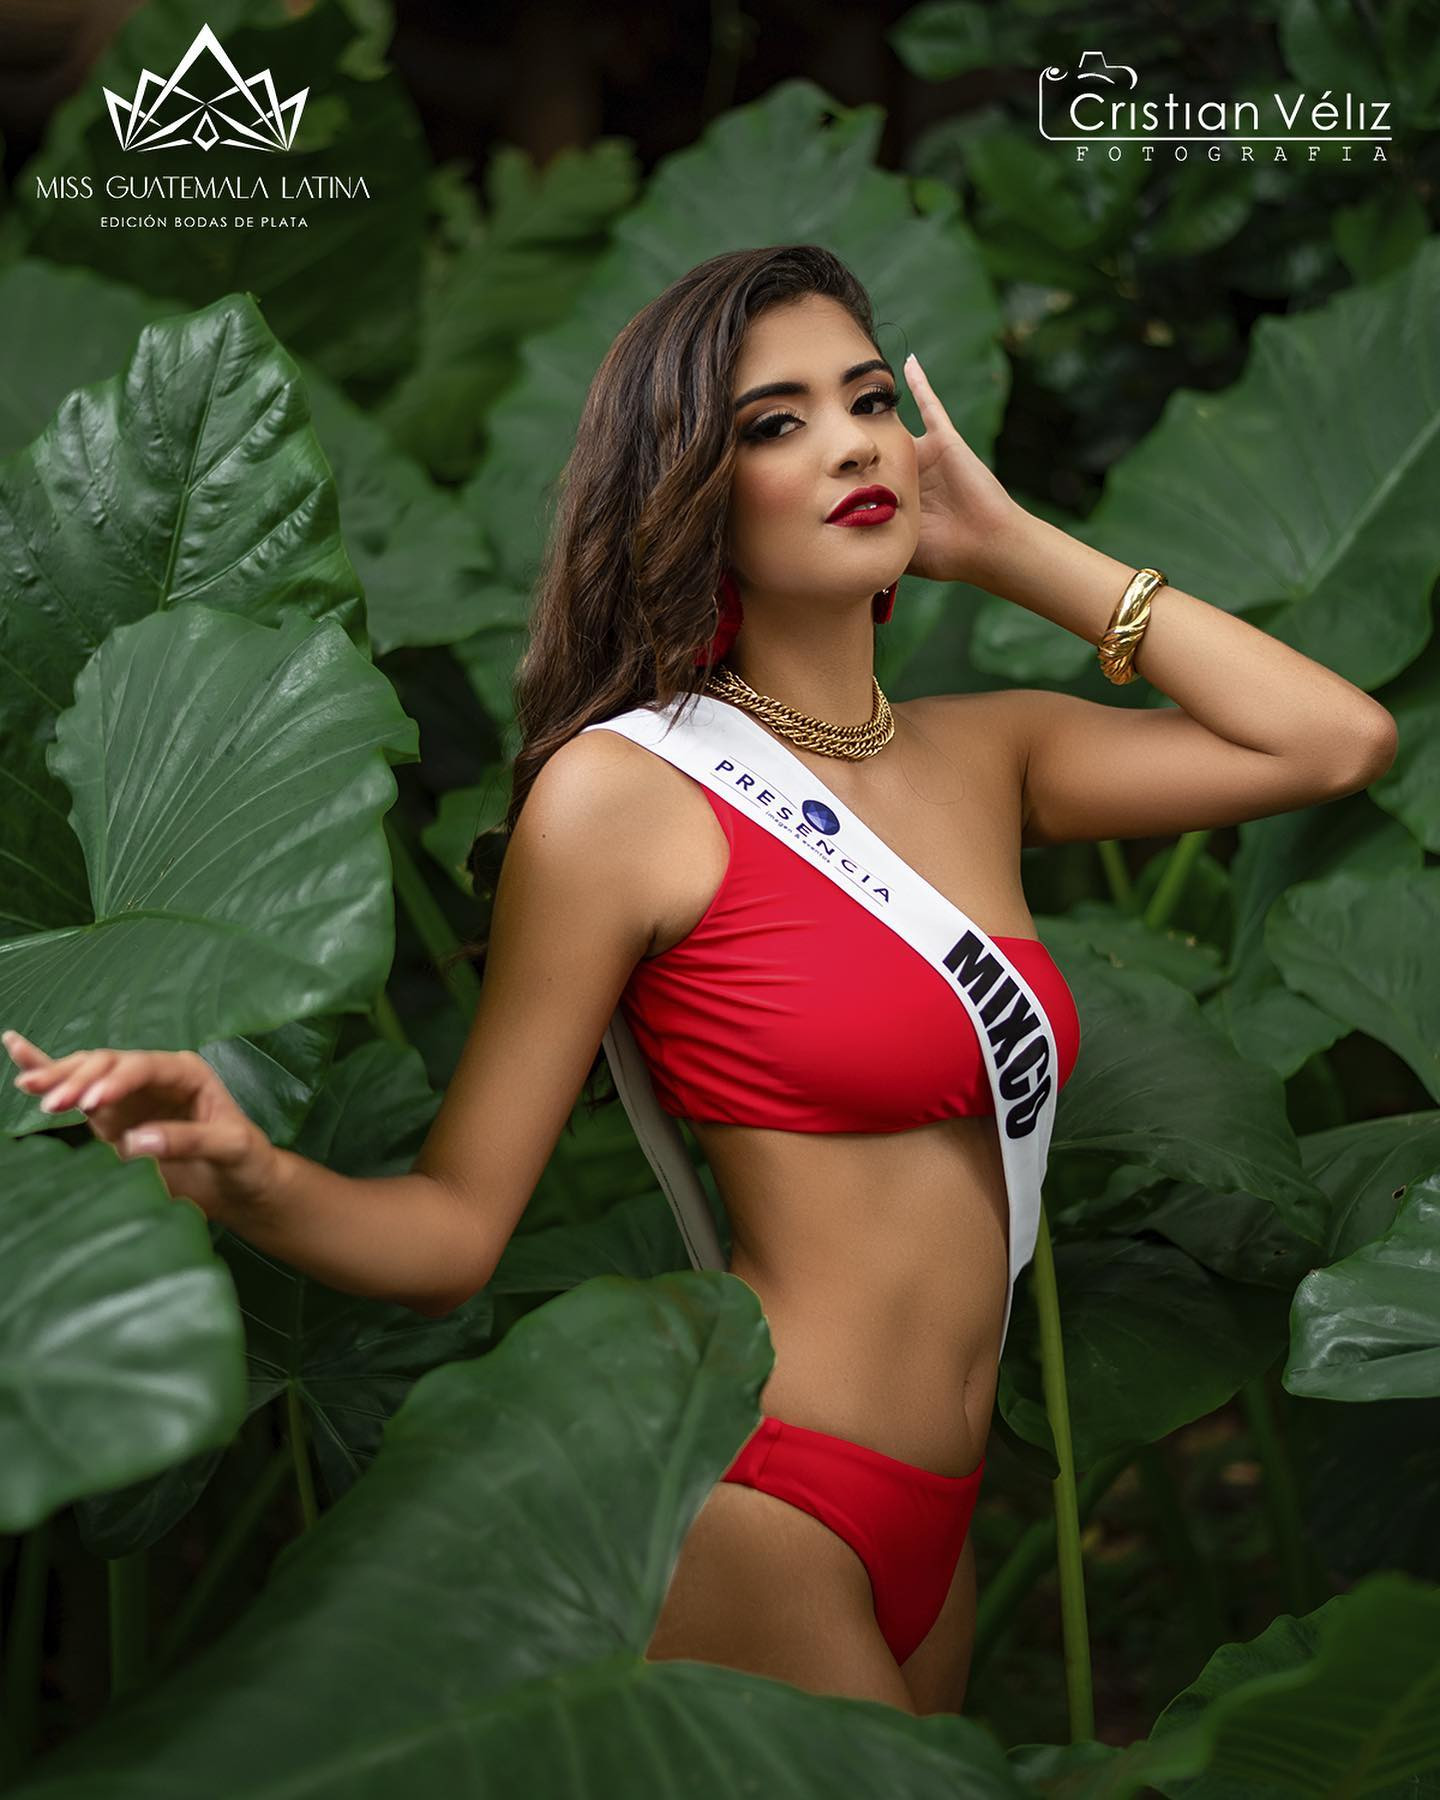 candidatas a miss guatemala latina 2021. final: 30 de abril. - Página 5 B3AqhJ